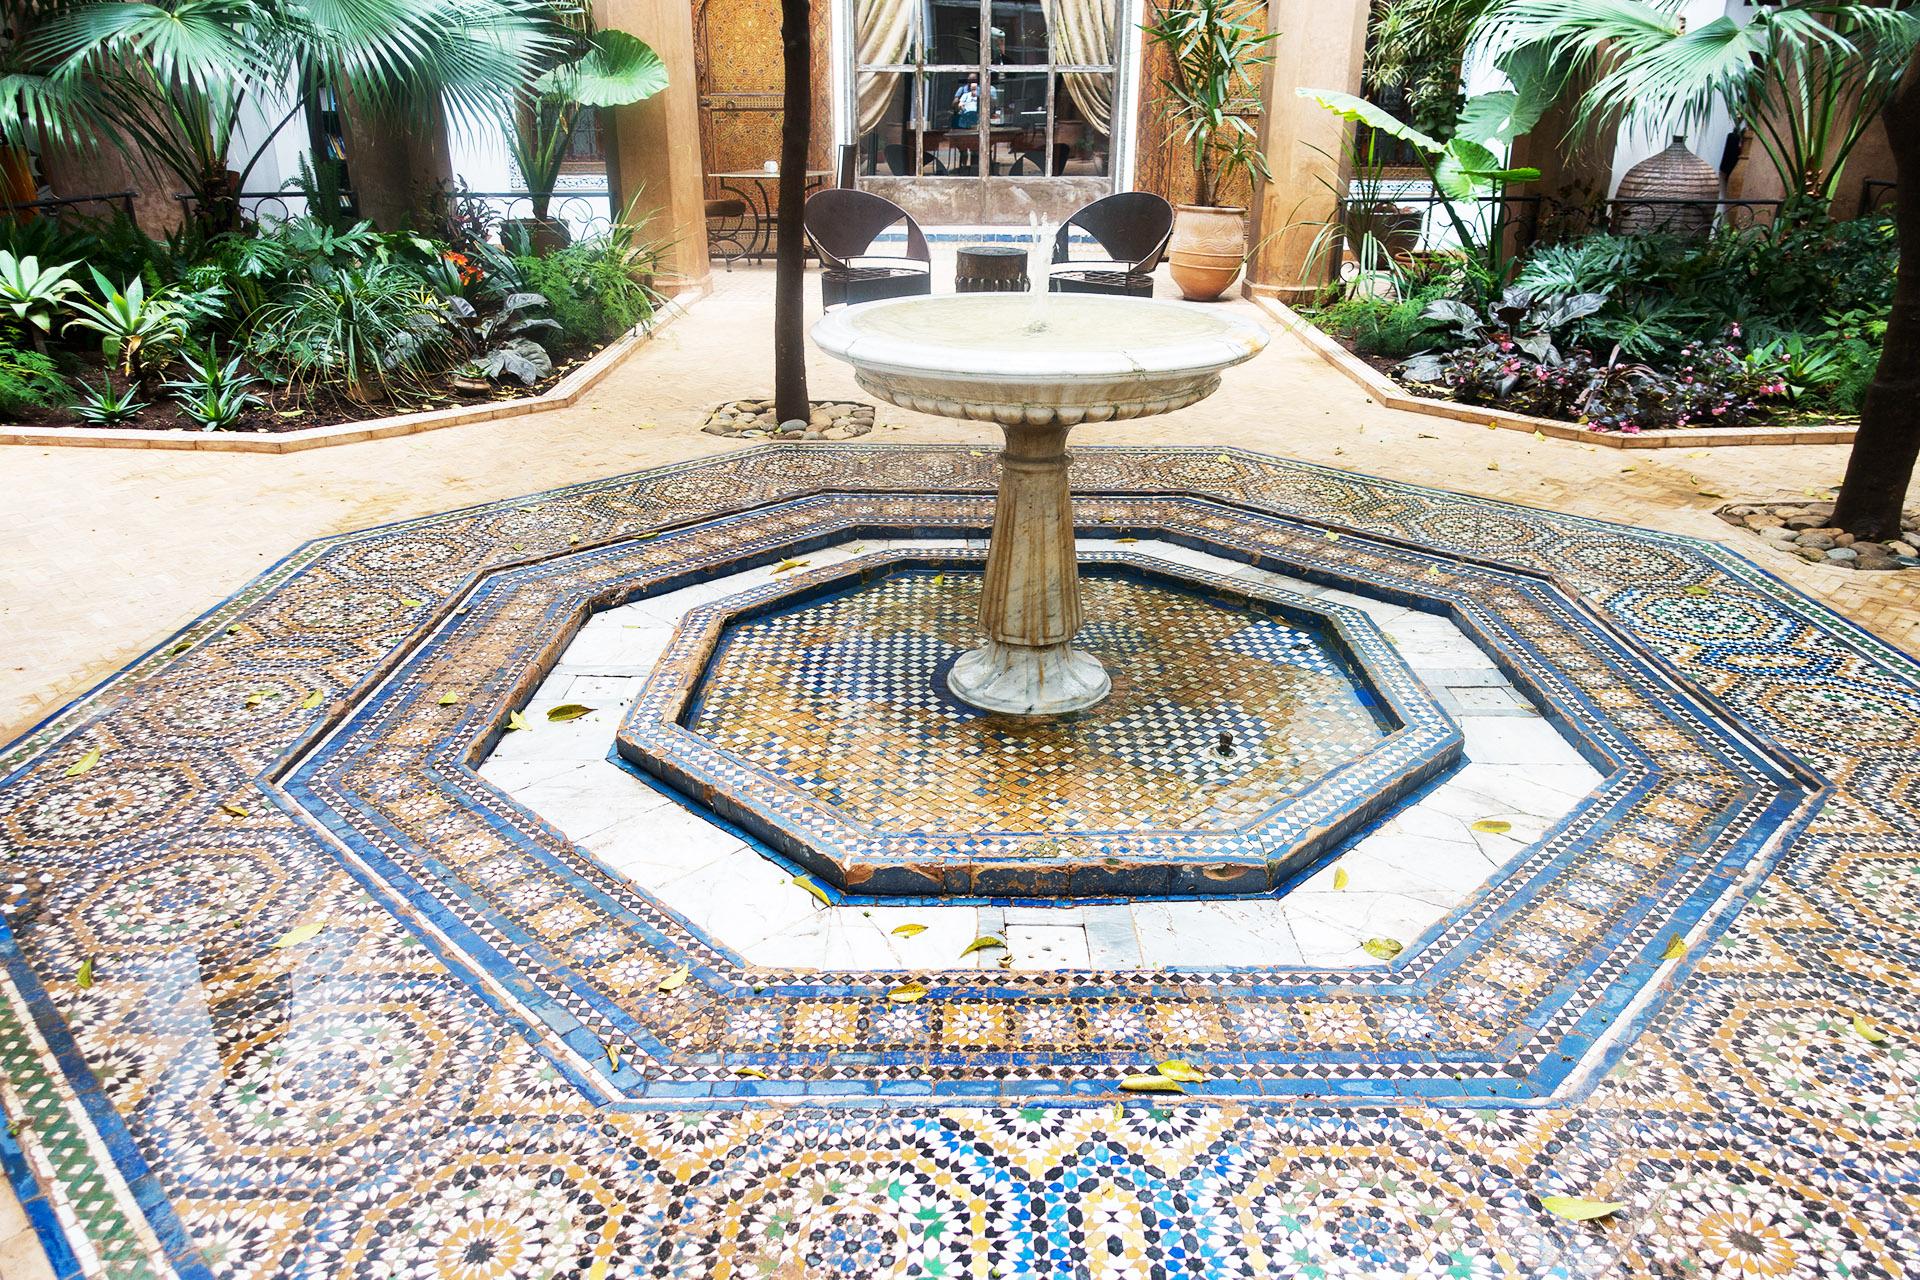 Riad Laaroussa's courtyard.